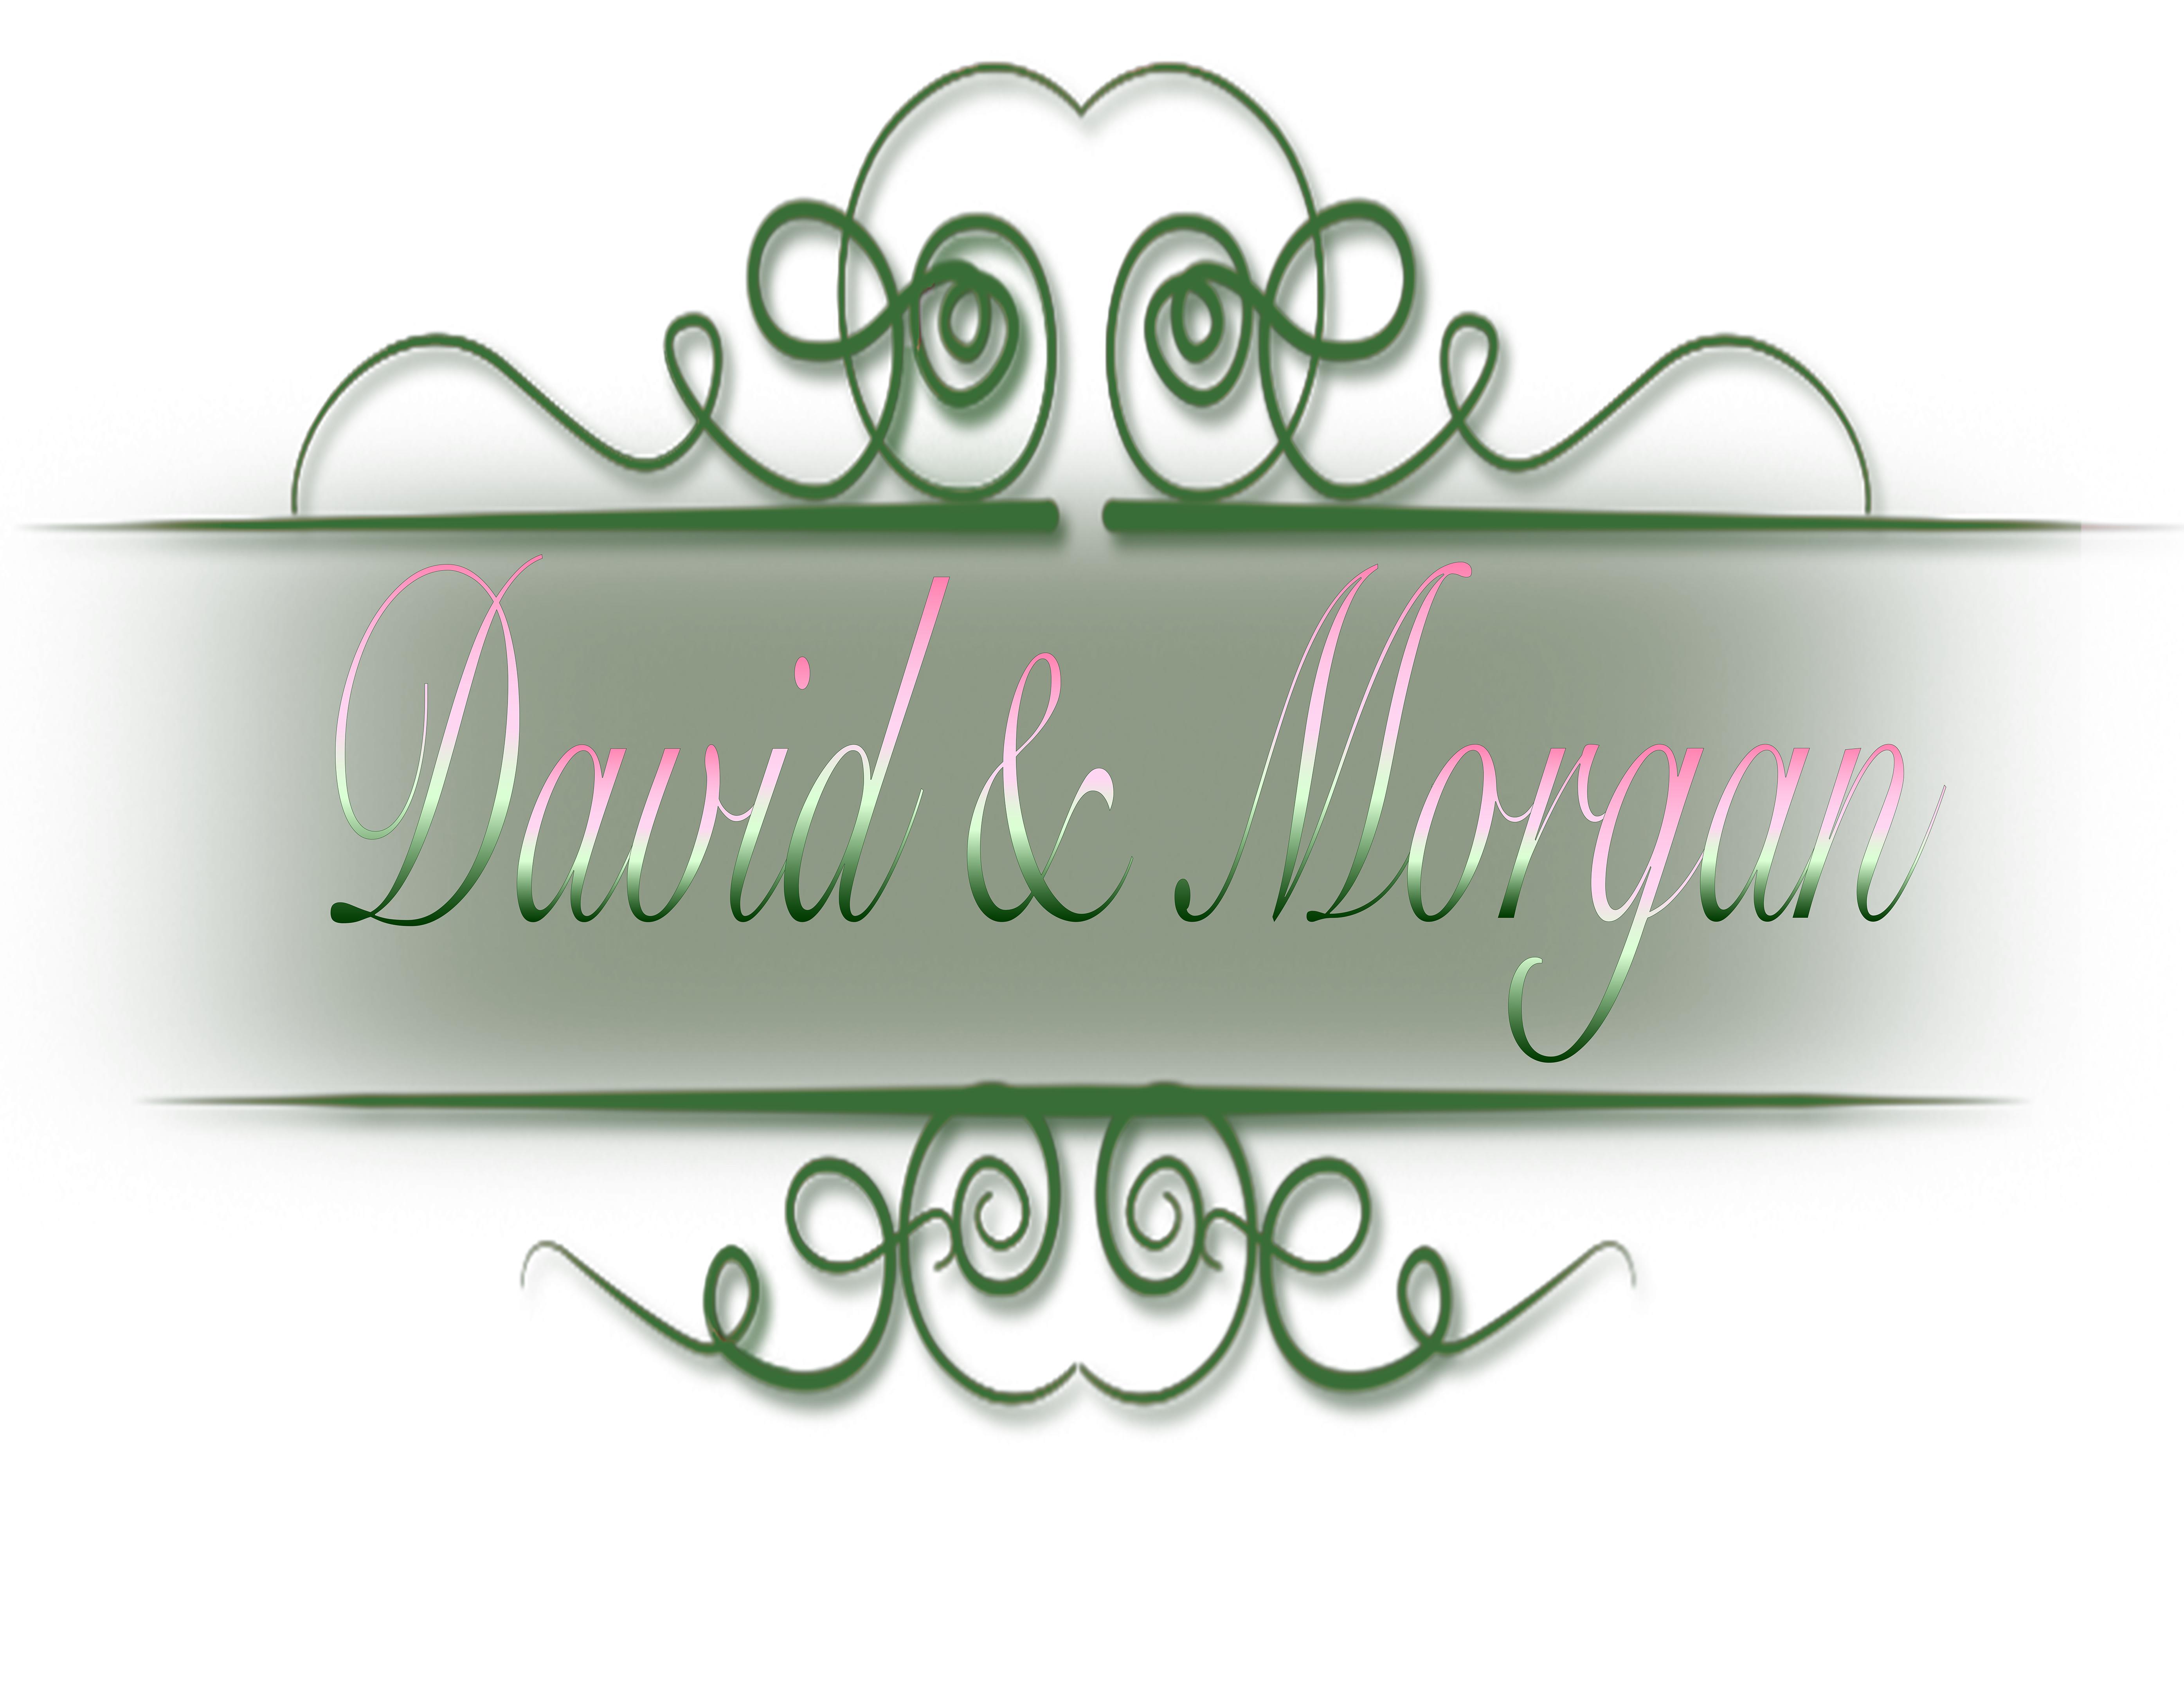 David.Morgan